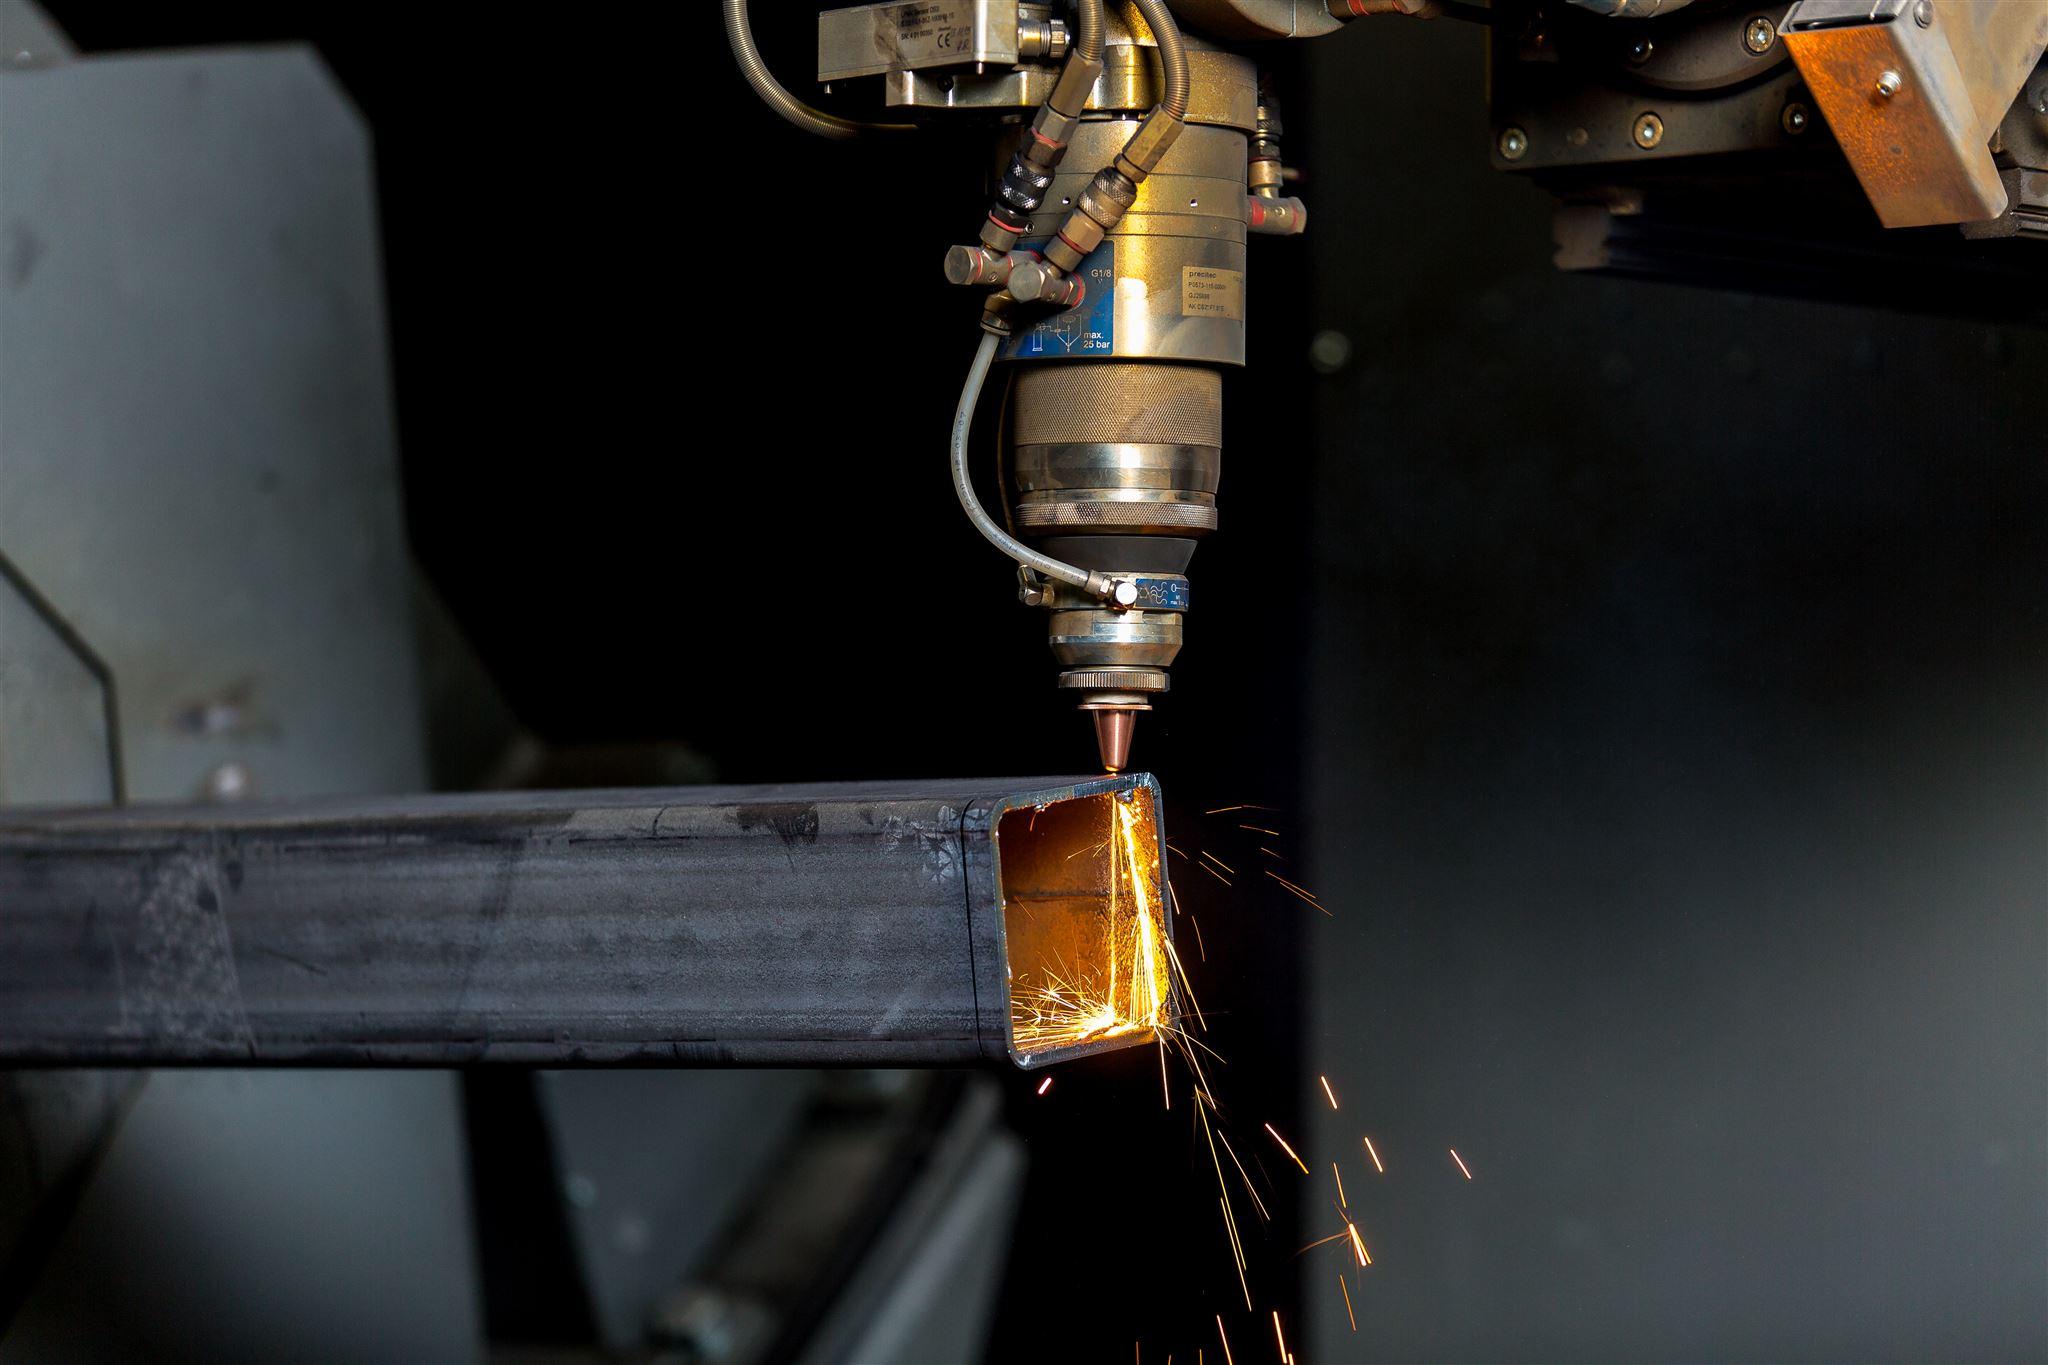 XXL 3D-Laserschneiden